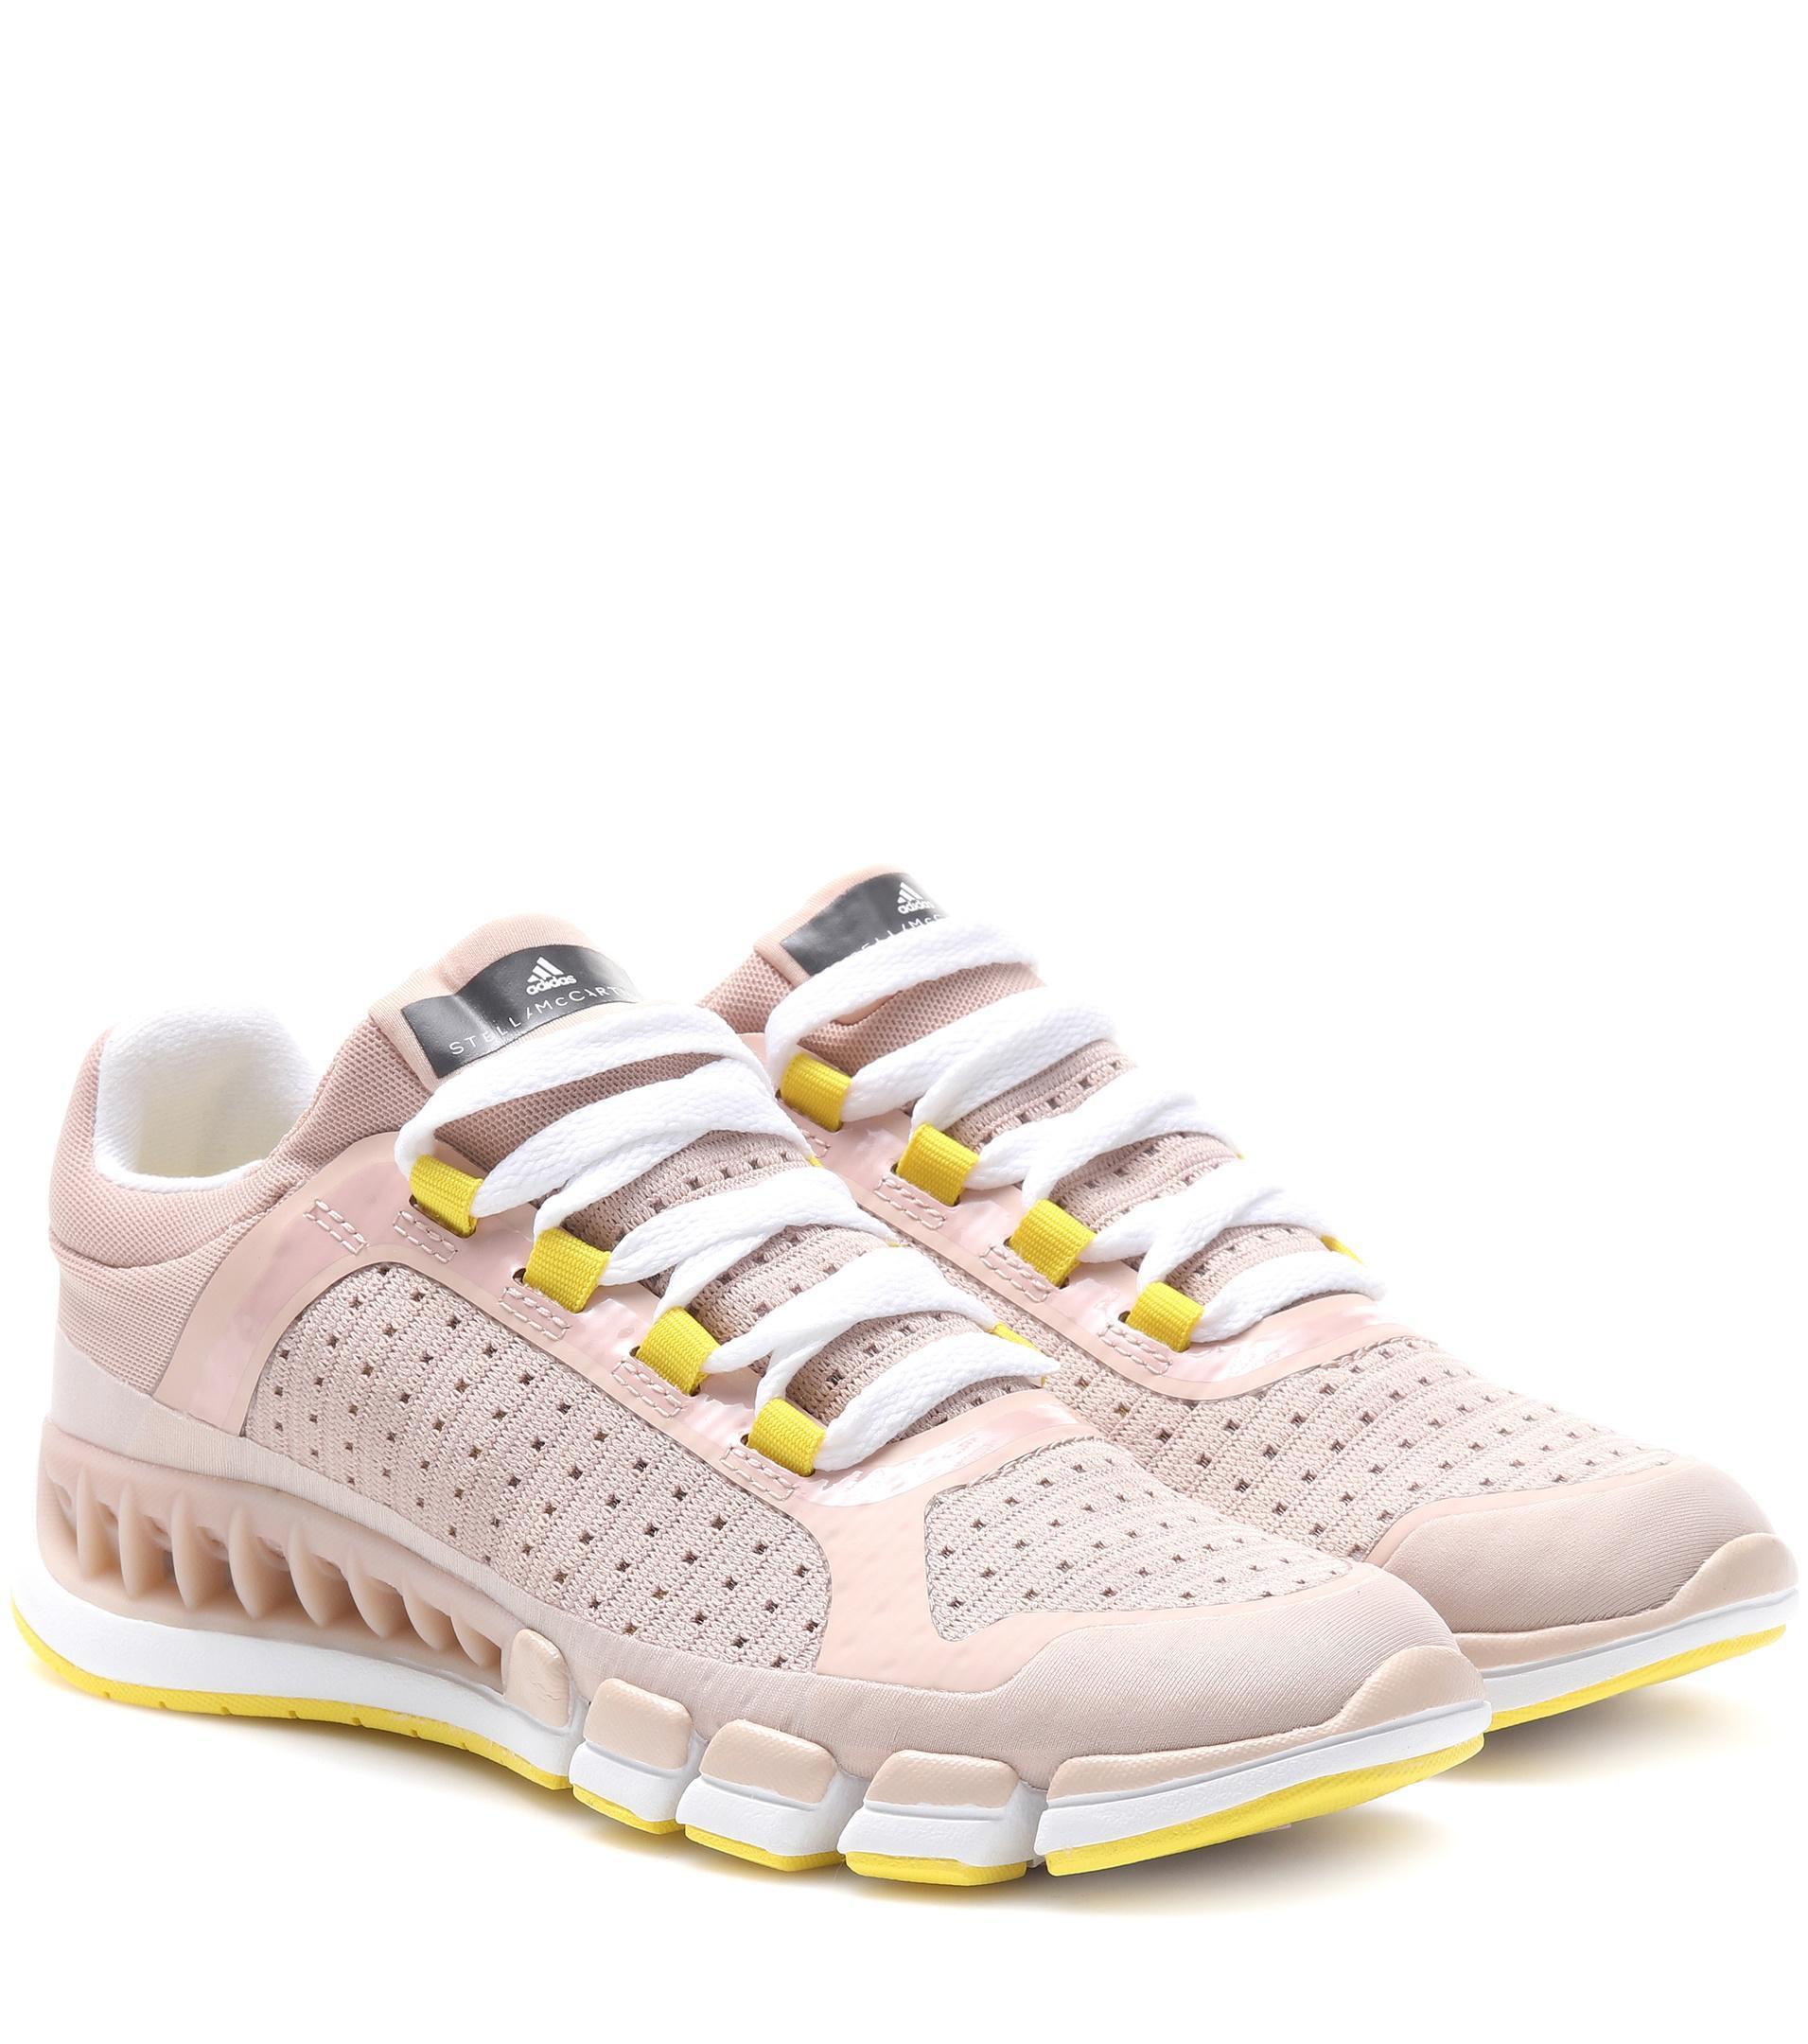 lyst adidas da stella mccartney rivoluzione scarpe rosa